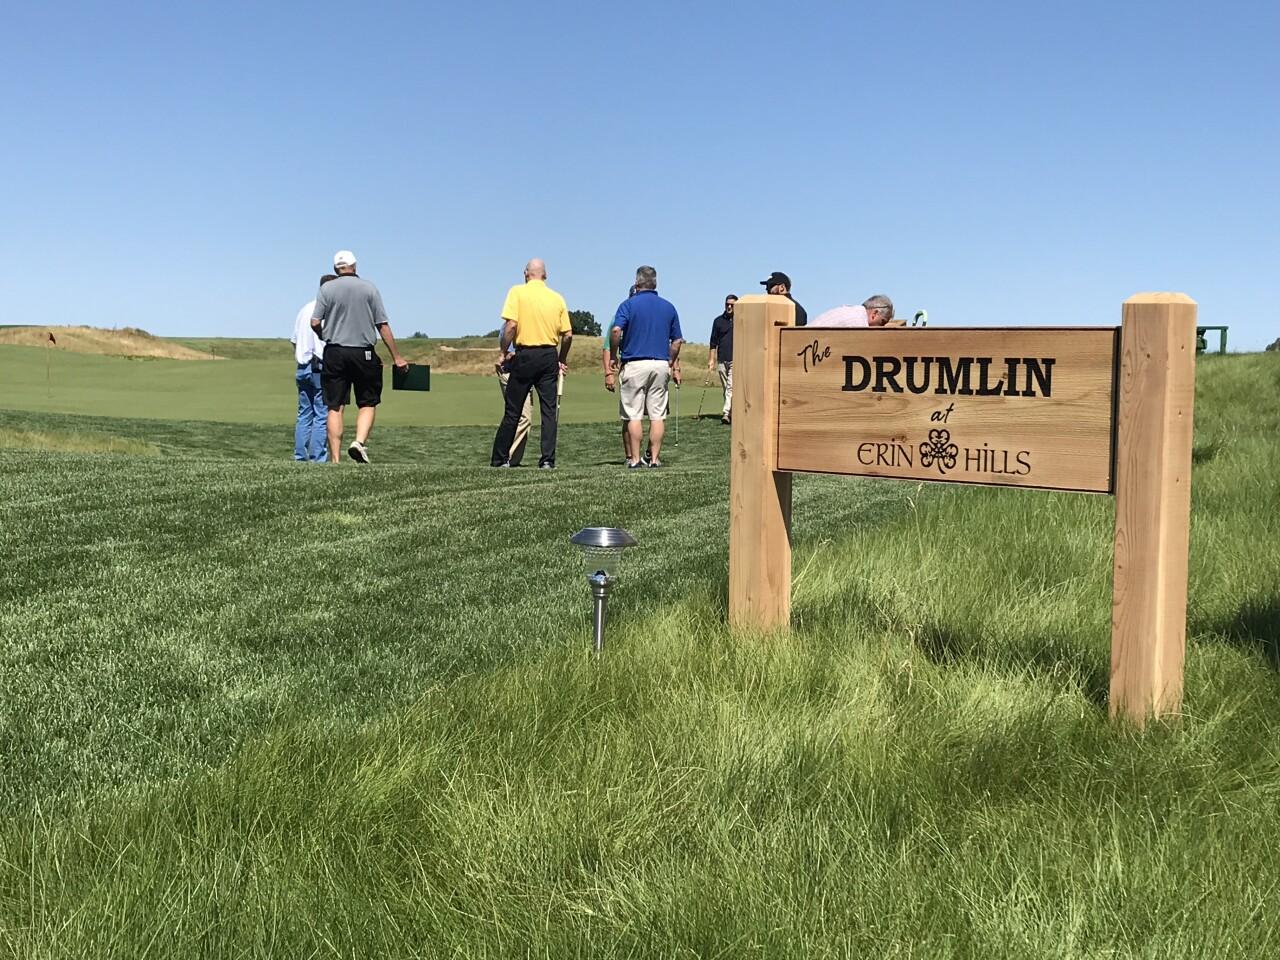 The Drumlin at Erin Hills